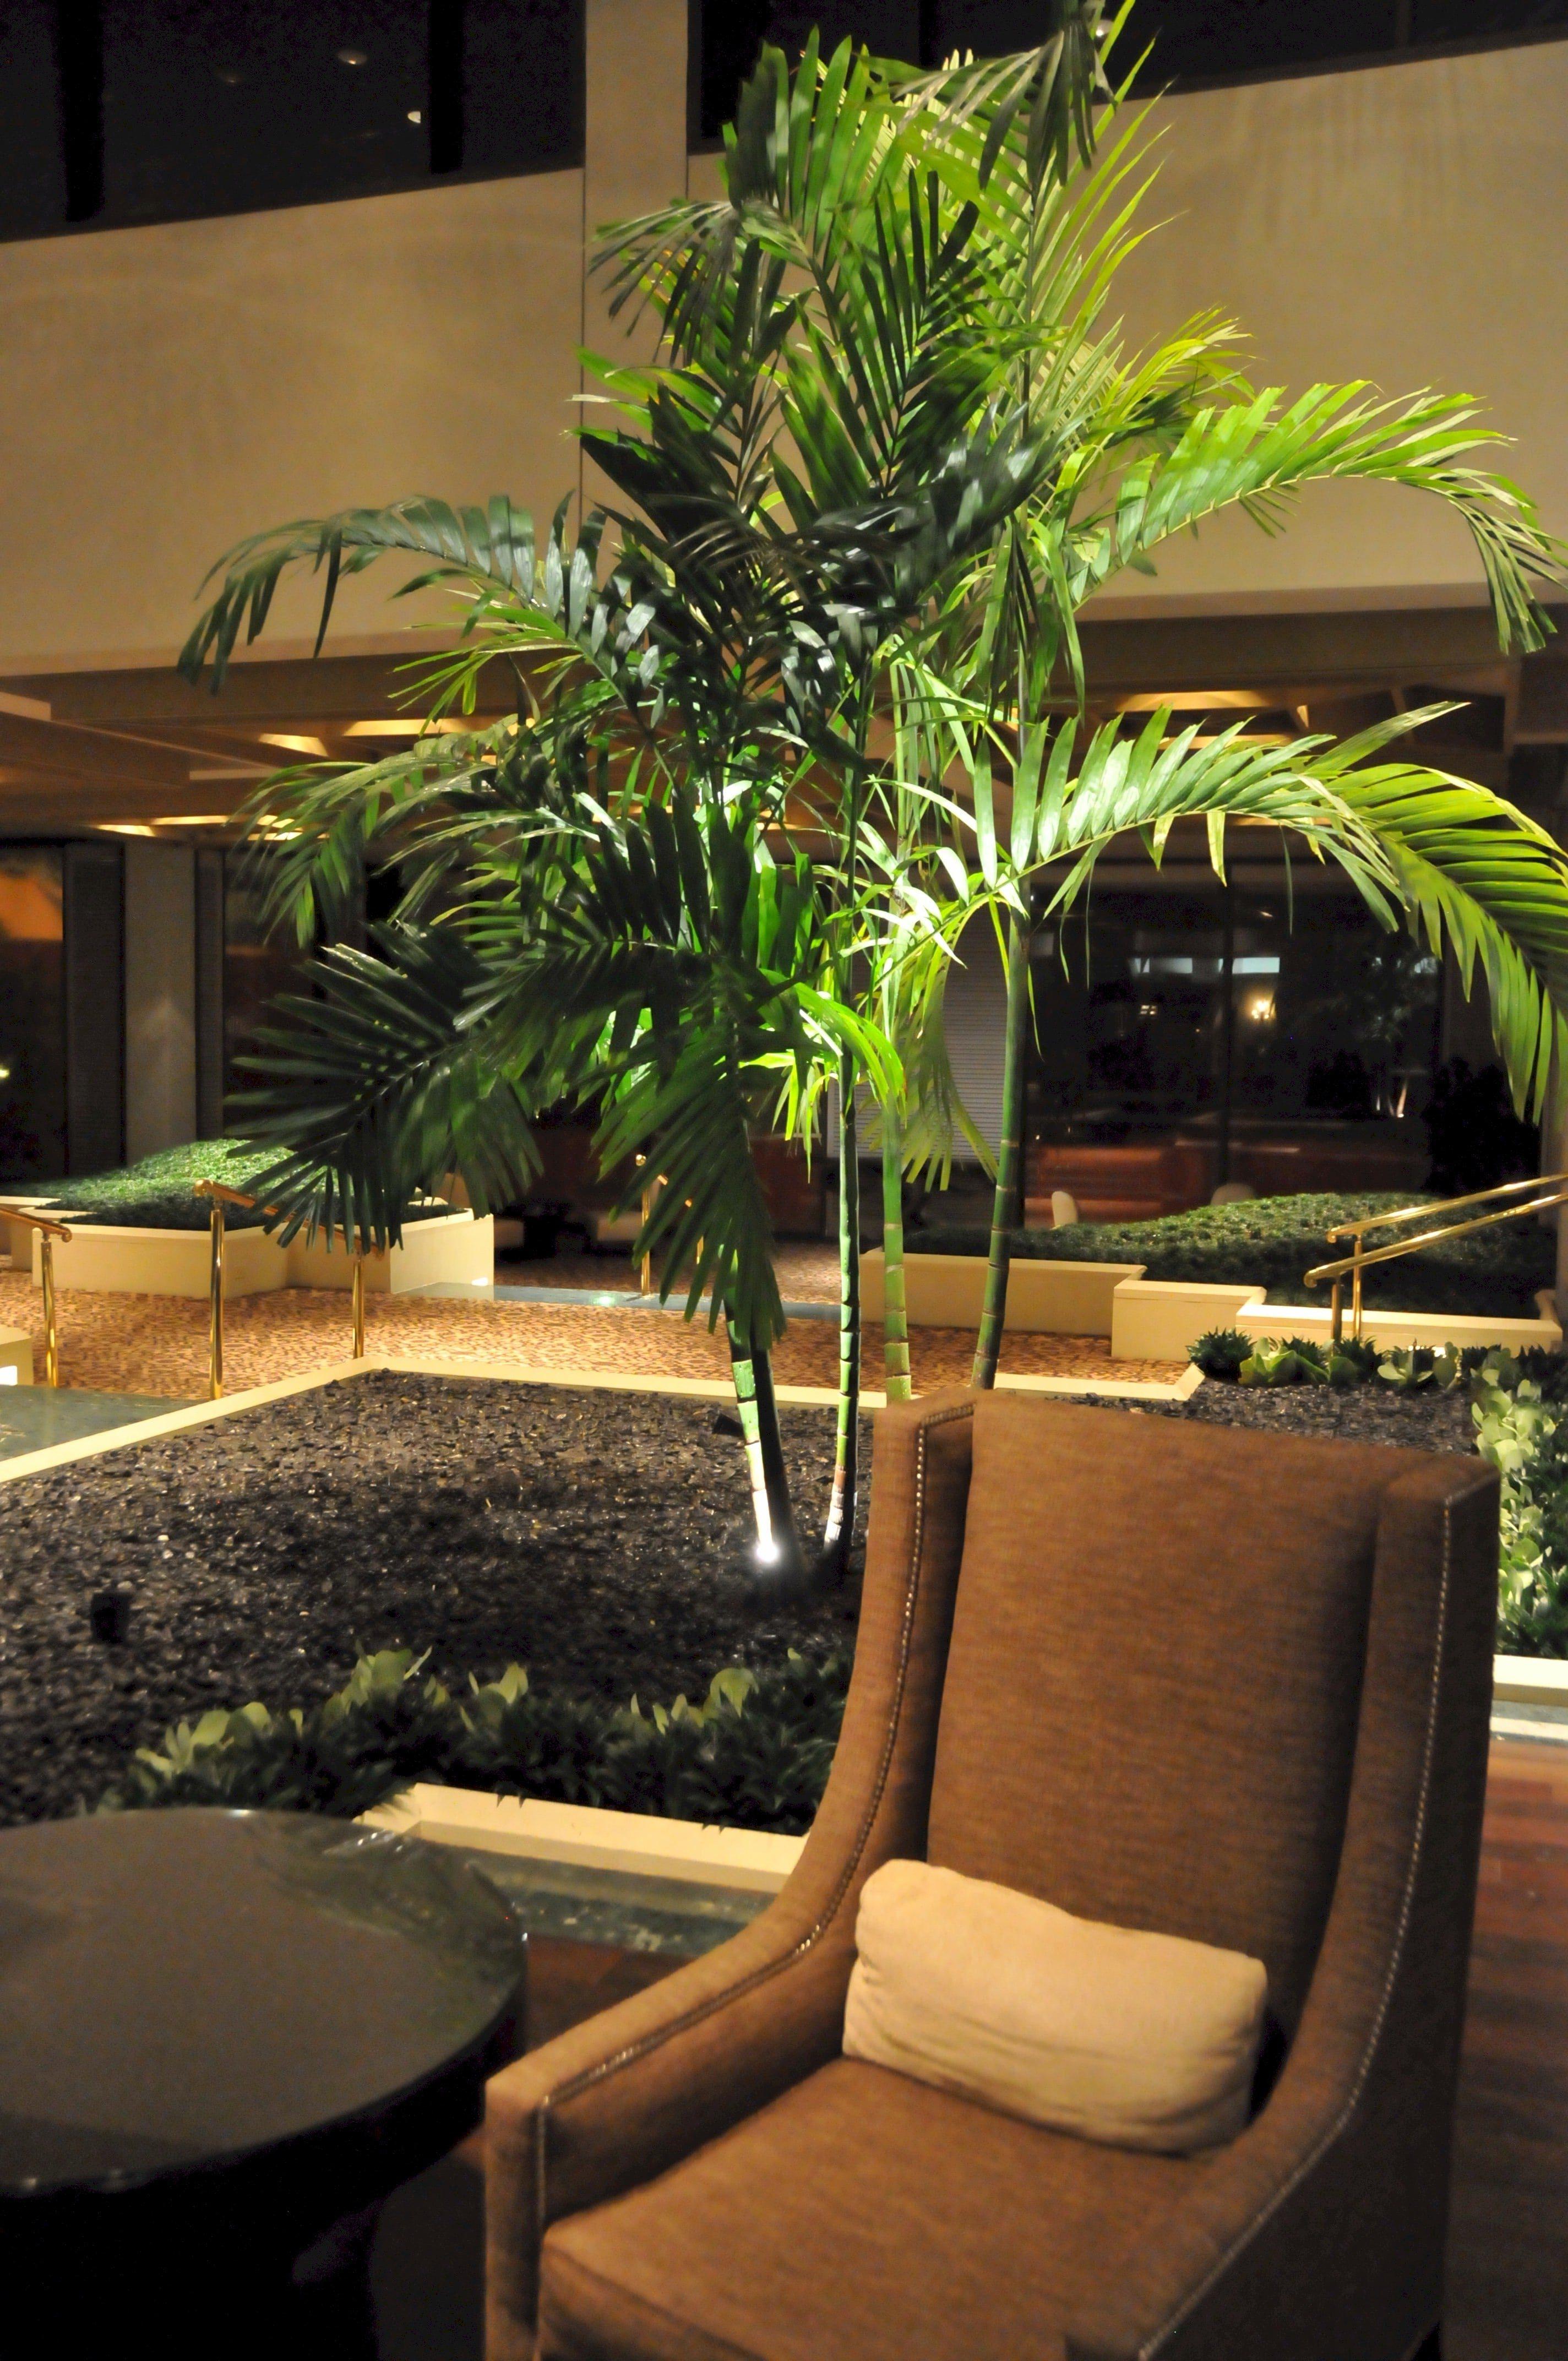 Omni Hotels Omni Houston Houston Texas Interiorscape Magazine 2010 Grand Award Texas